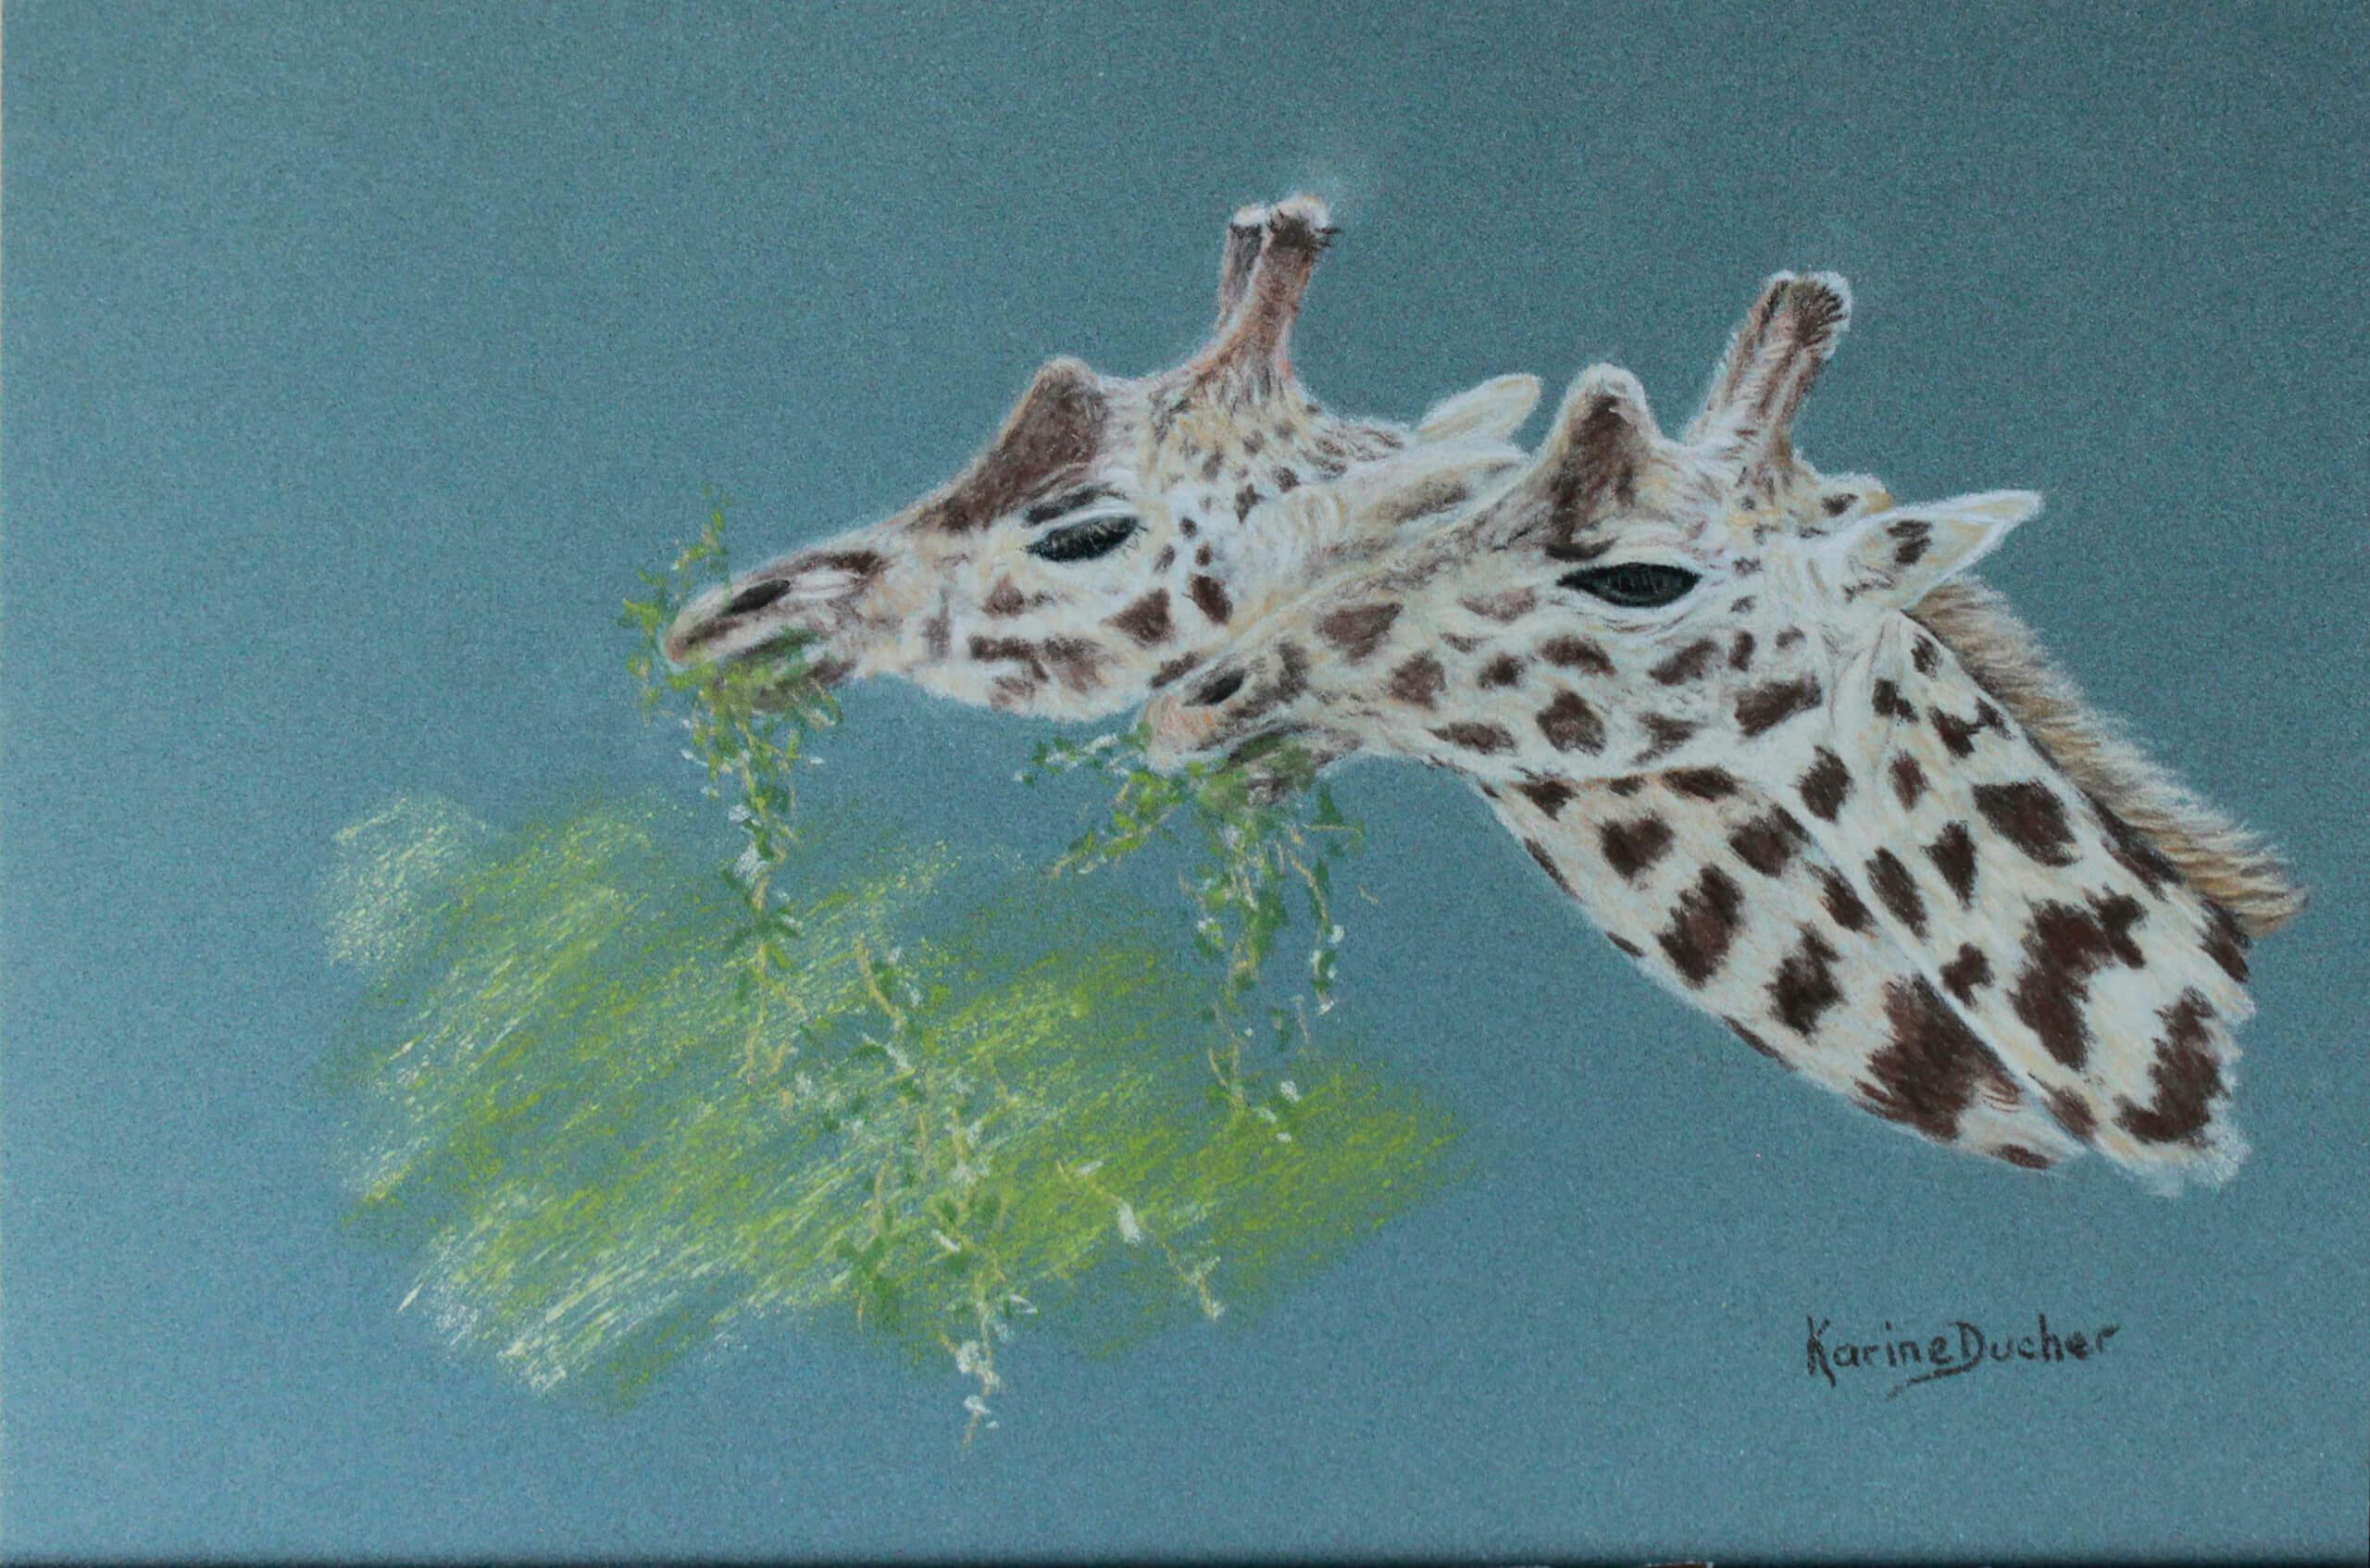 Karine D - Frères – girafes